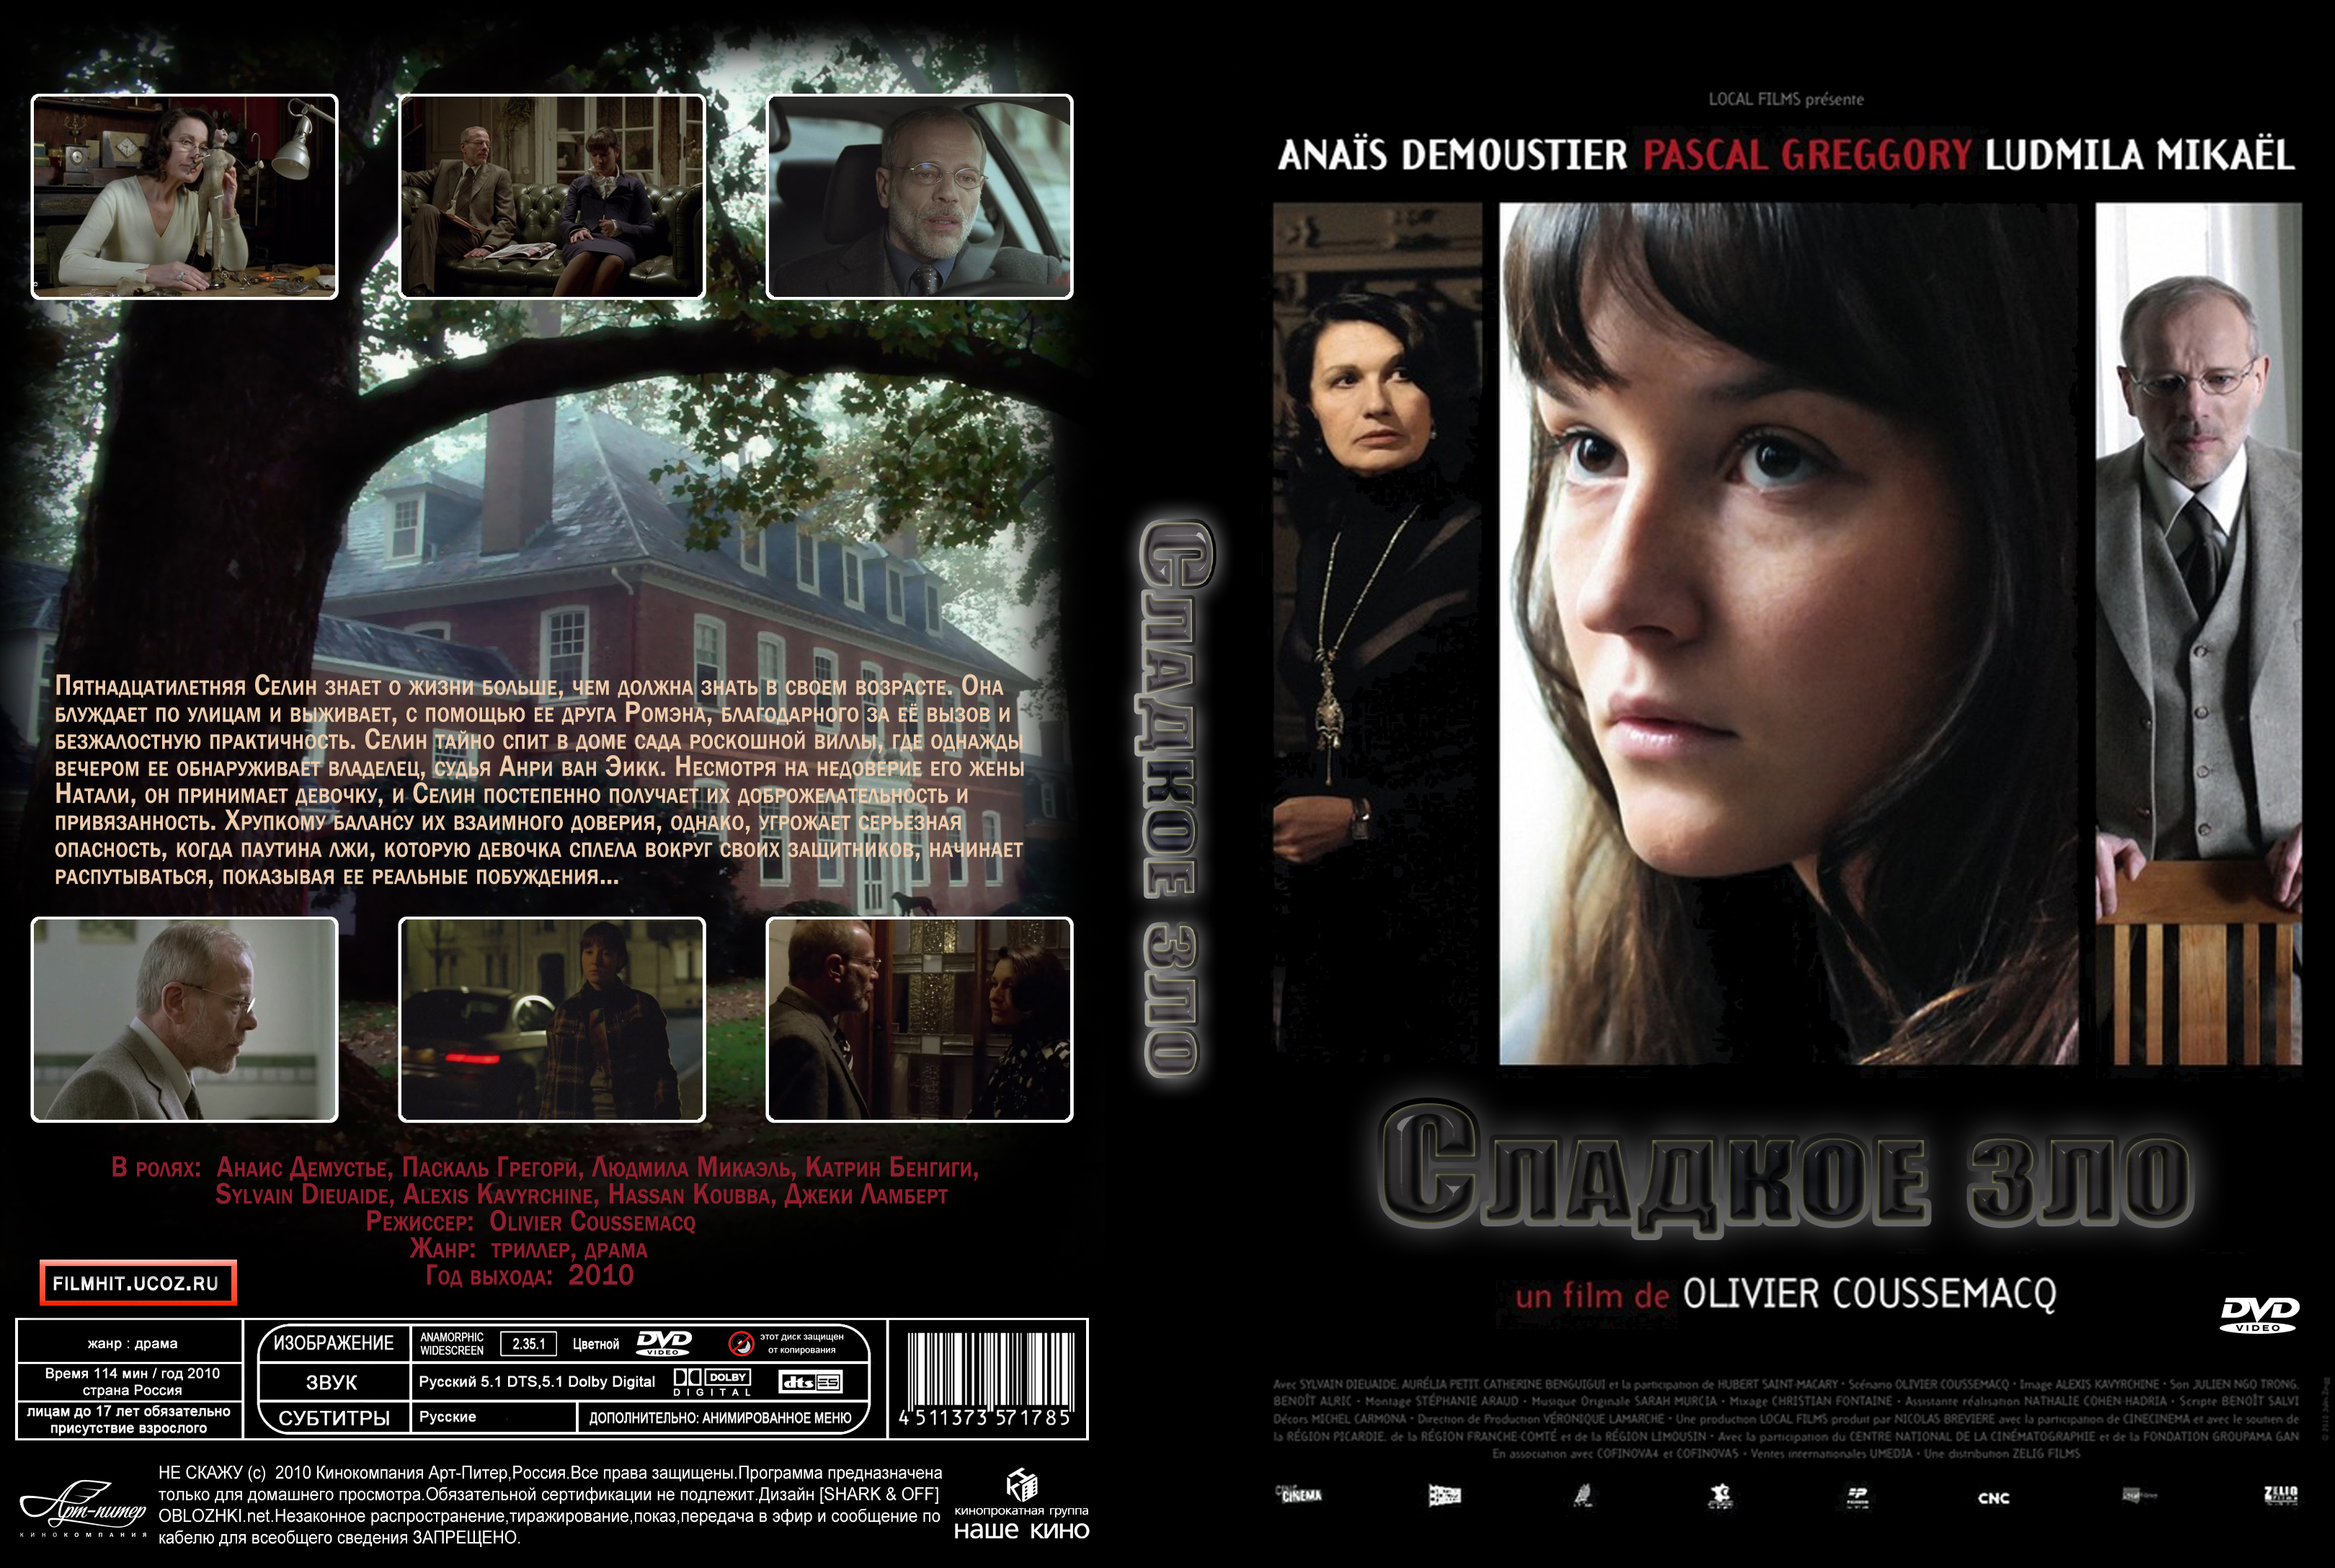 http://filmhit.ucoz.ru/_ld/1/102_KgT.jpg